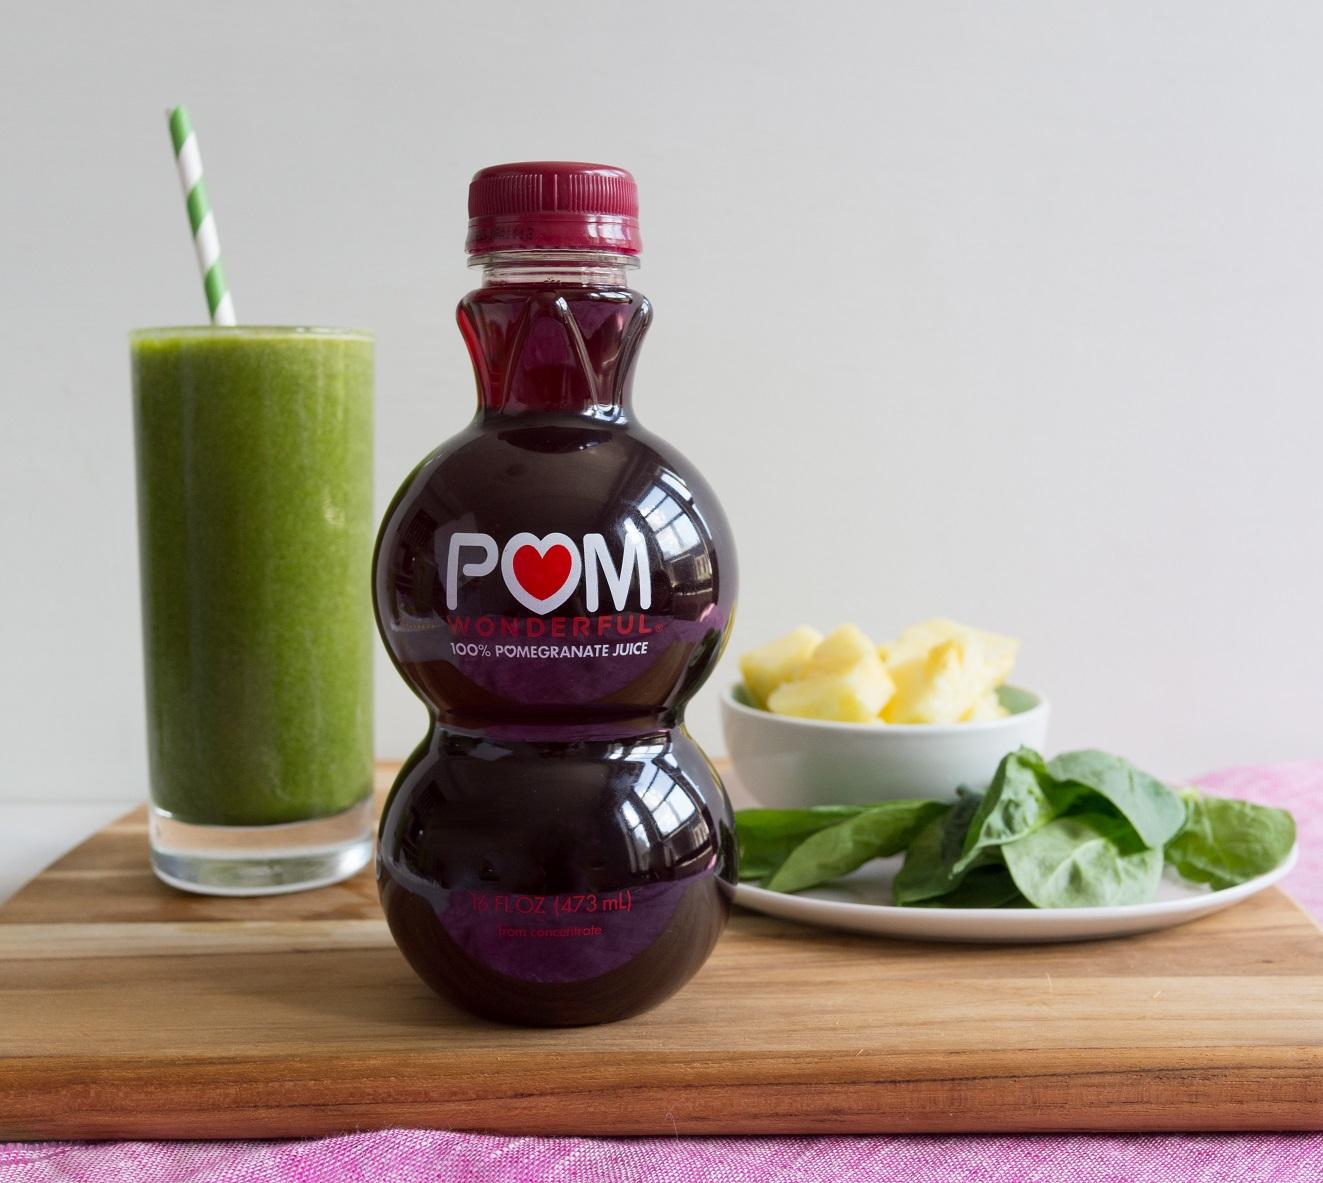 pom_green_goddess_smoothie_bottle